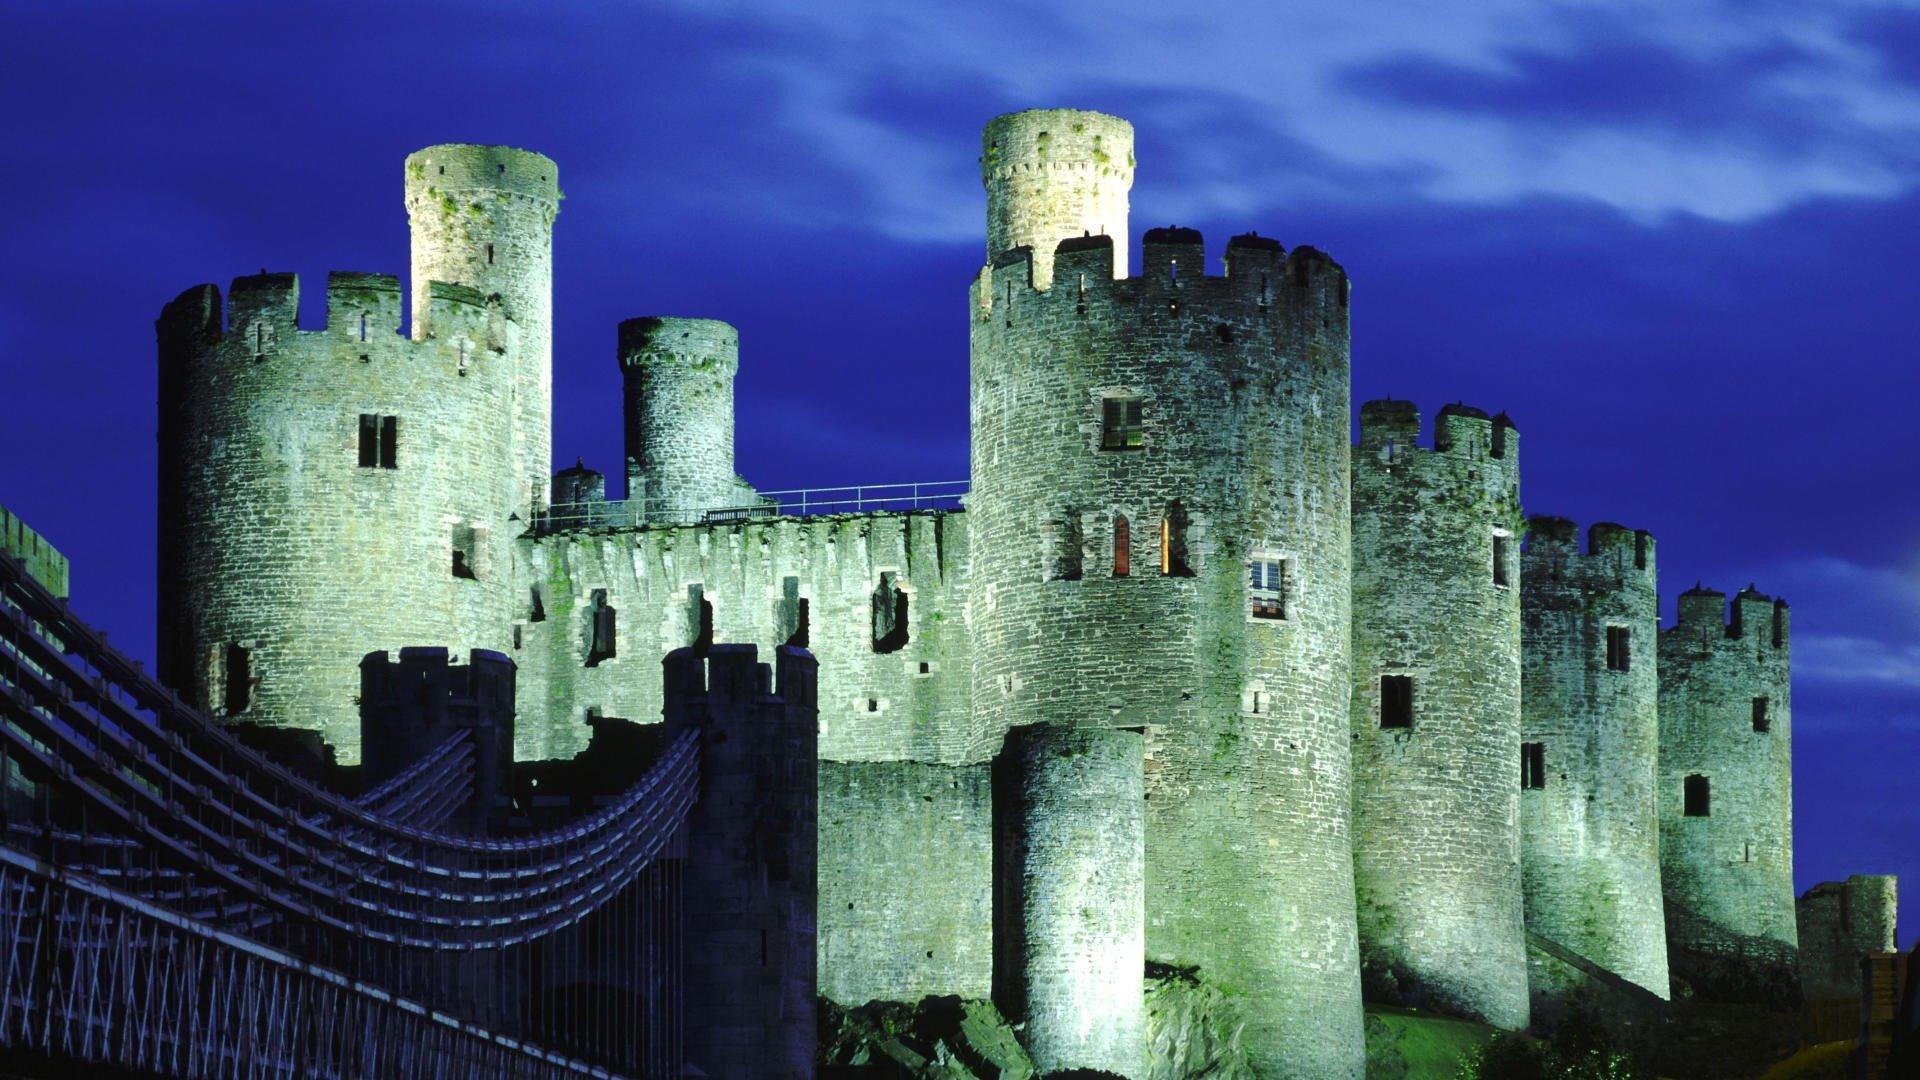 castles wales wallpapers castle wallpaper images 1920x1080 1920x1080